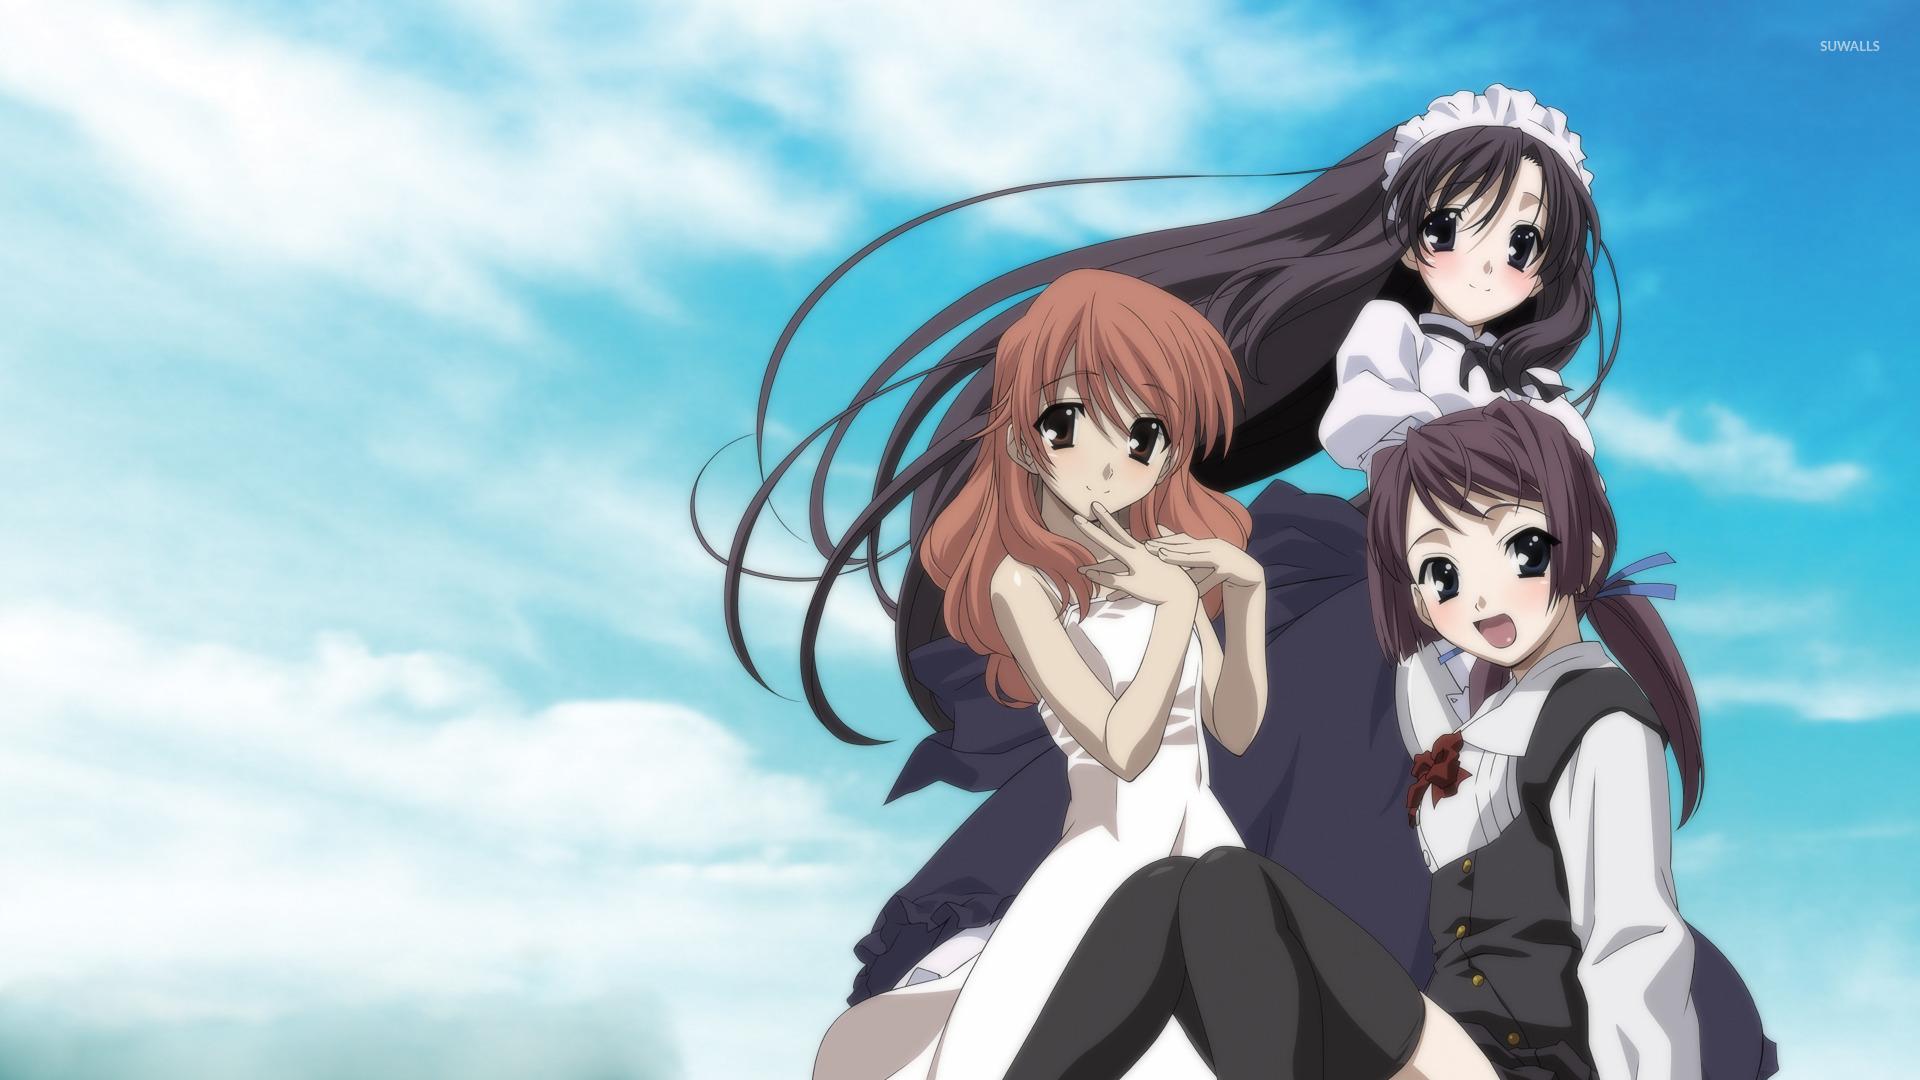 Unduh 50 Wallpaper Anime Days Hd Gratis Terbaik